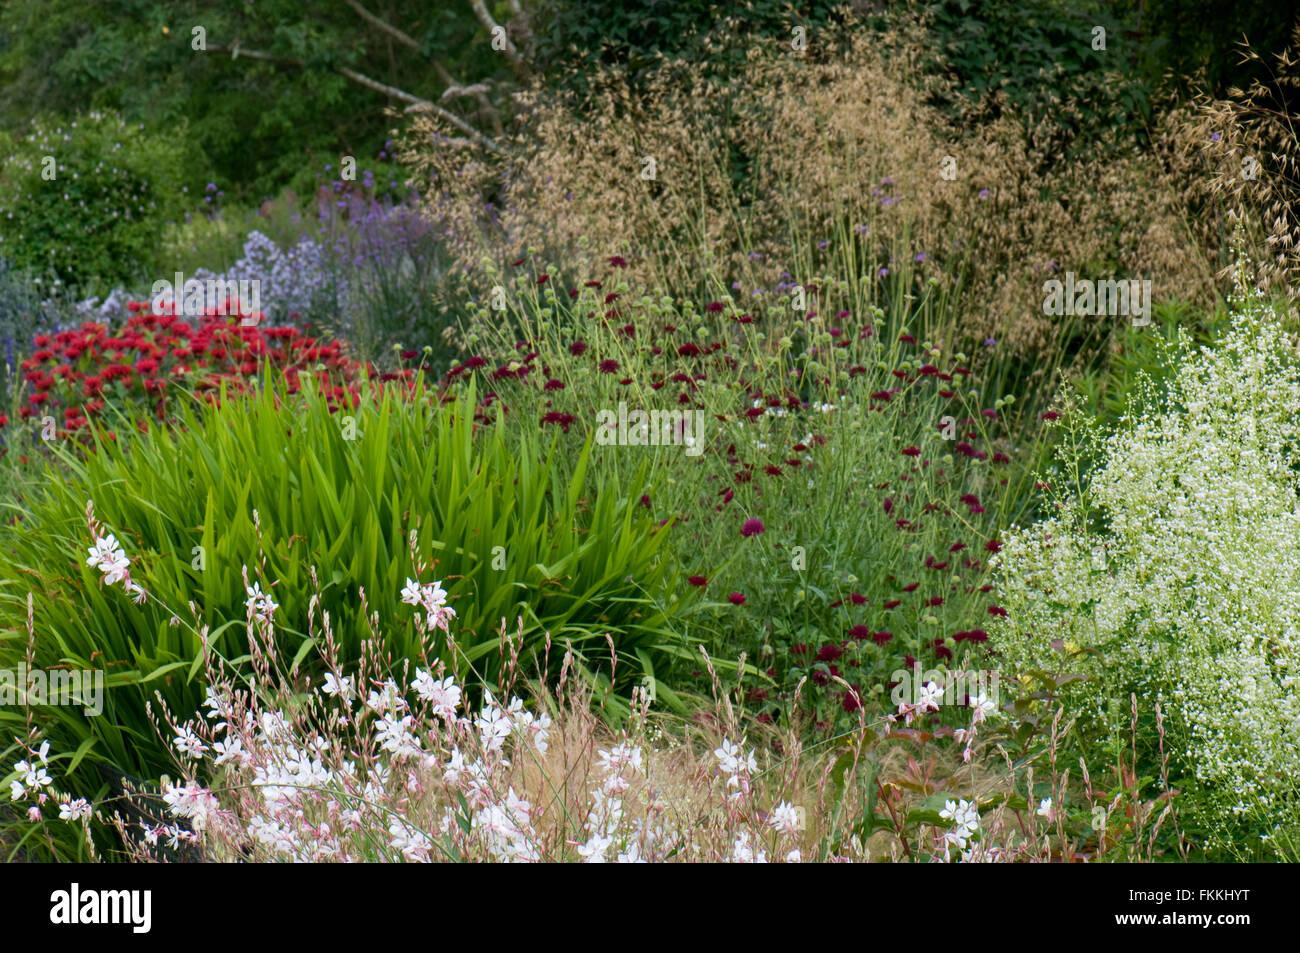 Mixed herbaceous border in summer. Including Gaura 'Whirling Butterflies', Crocosmia, Monarda, Stipa and Knautia Stock Photo